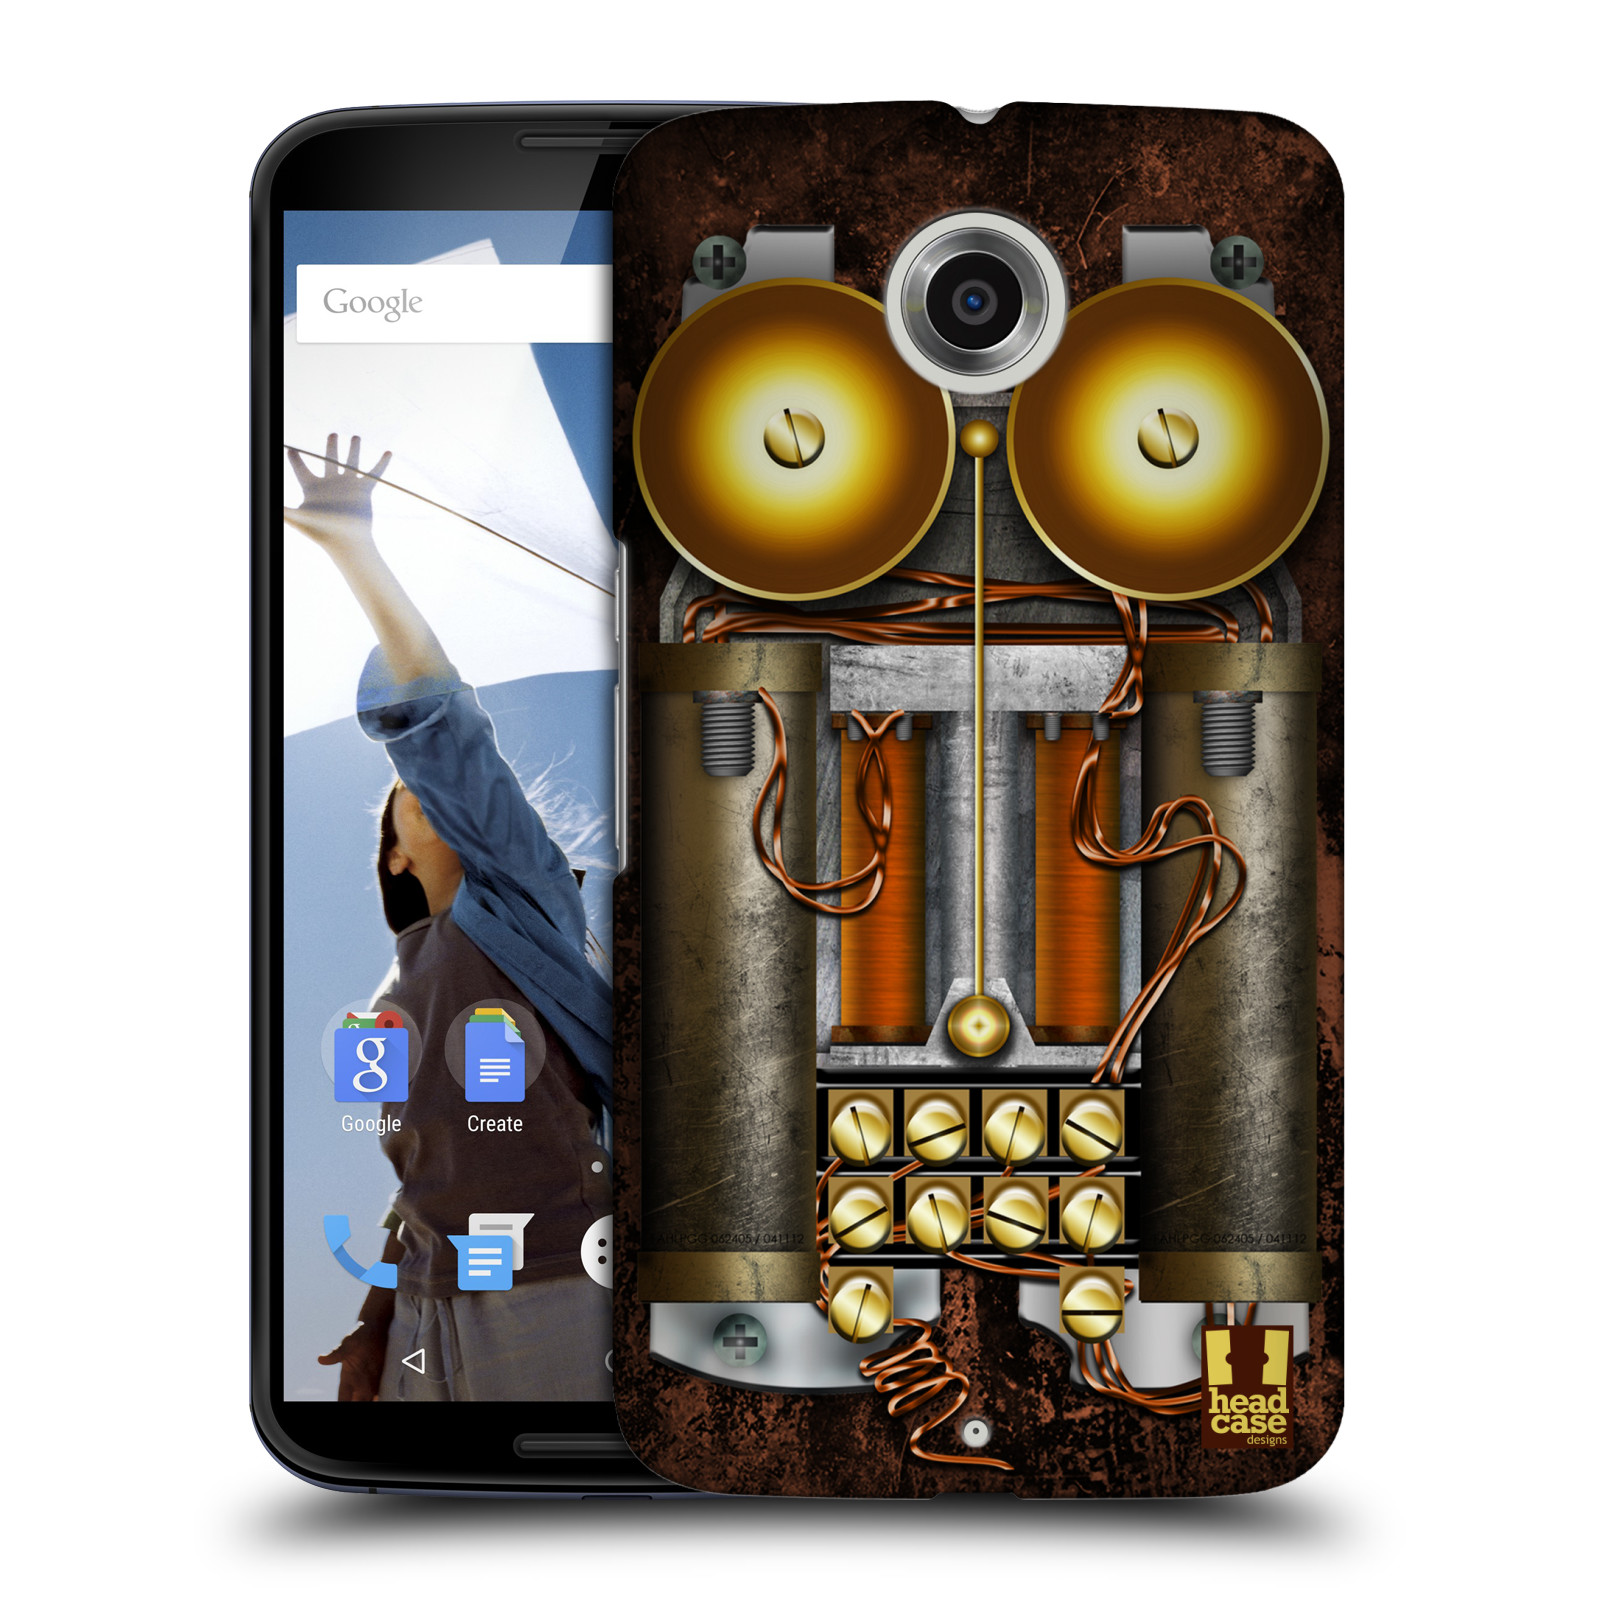 Plastové pouzdro na mobil Motorola Nexus 6 HEAD CASE STEAMPUNK TELEFON (Kryt či obal na mobilní telefon Motorola Nexus 6)